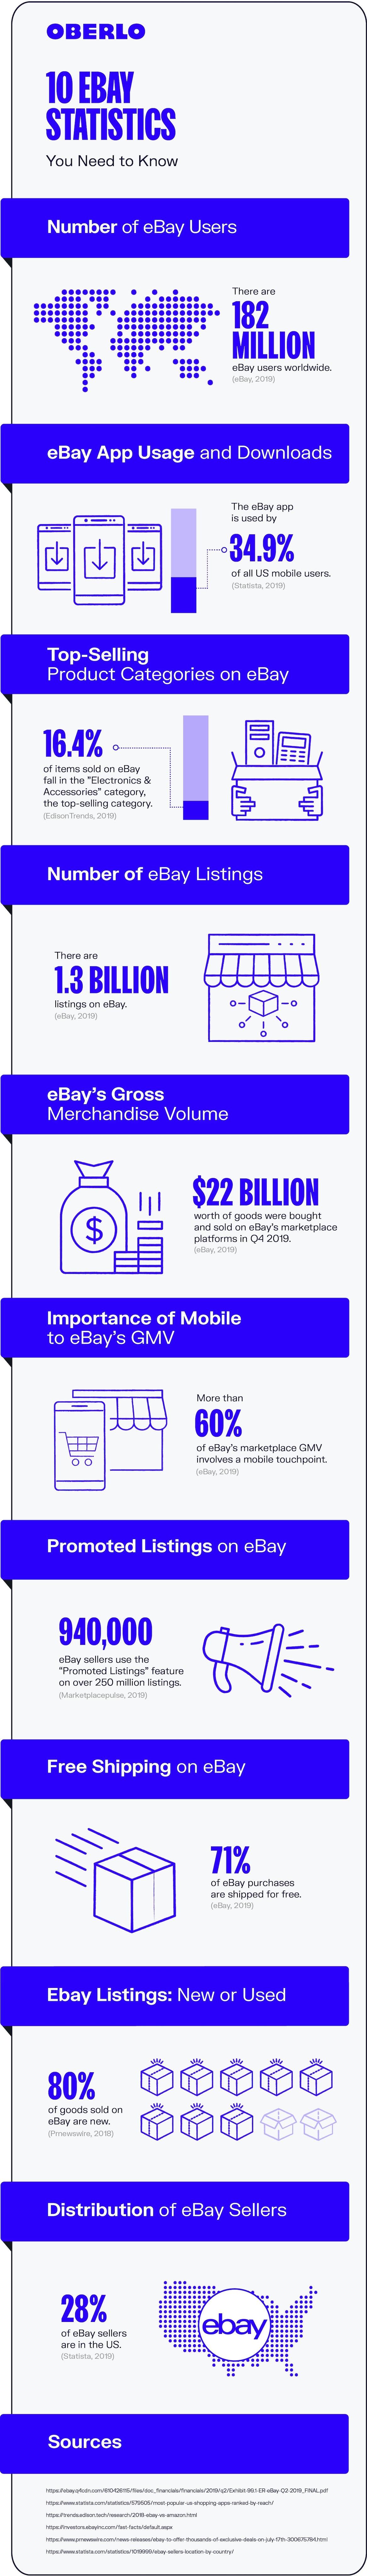 eBay Statistics 2020